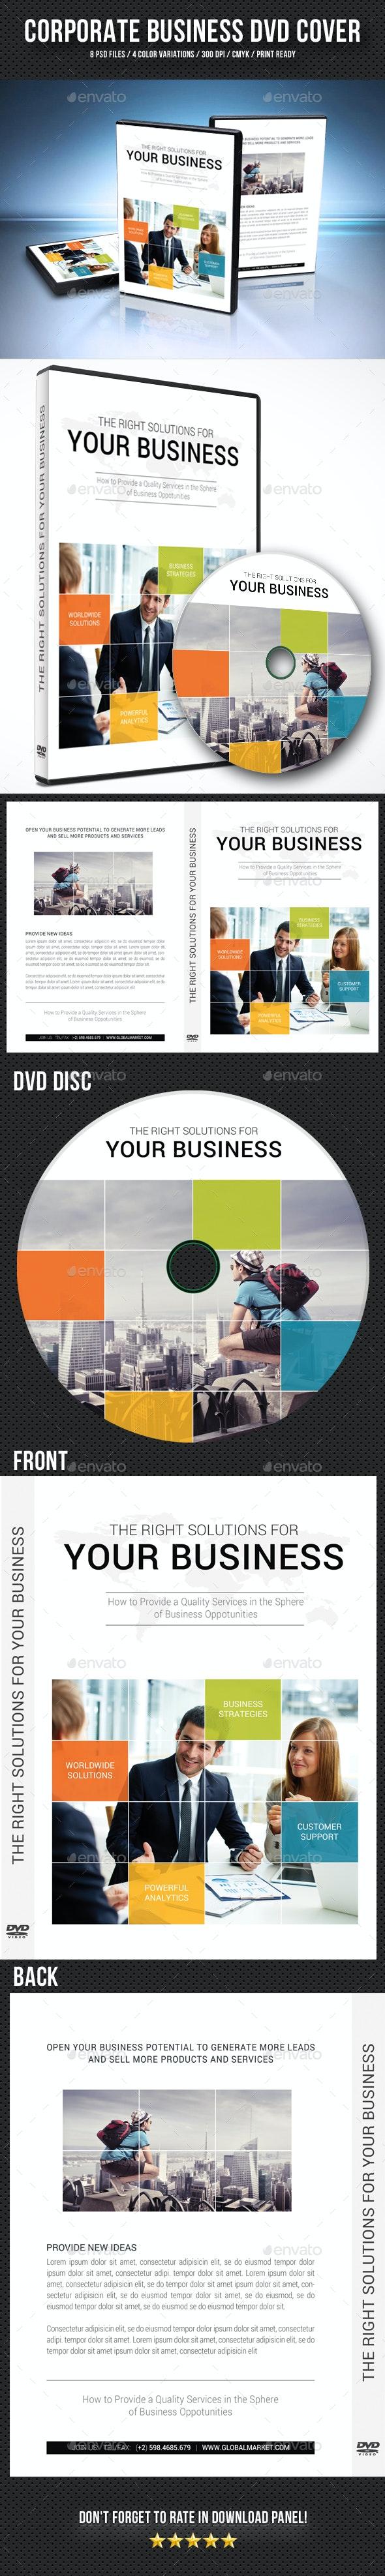 Corporate Business DVD Cover Template V11 - CD & DVD Artwork Print Templates